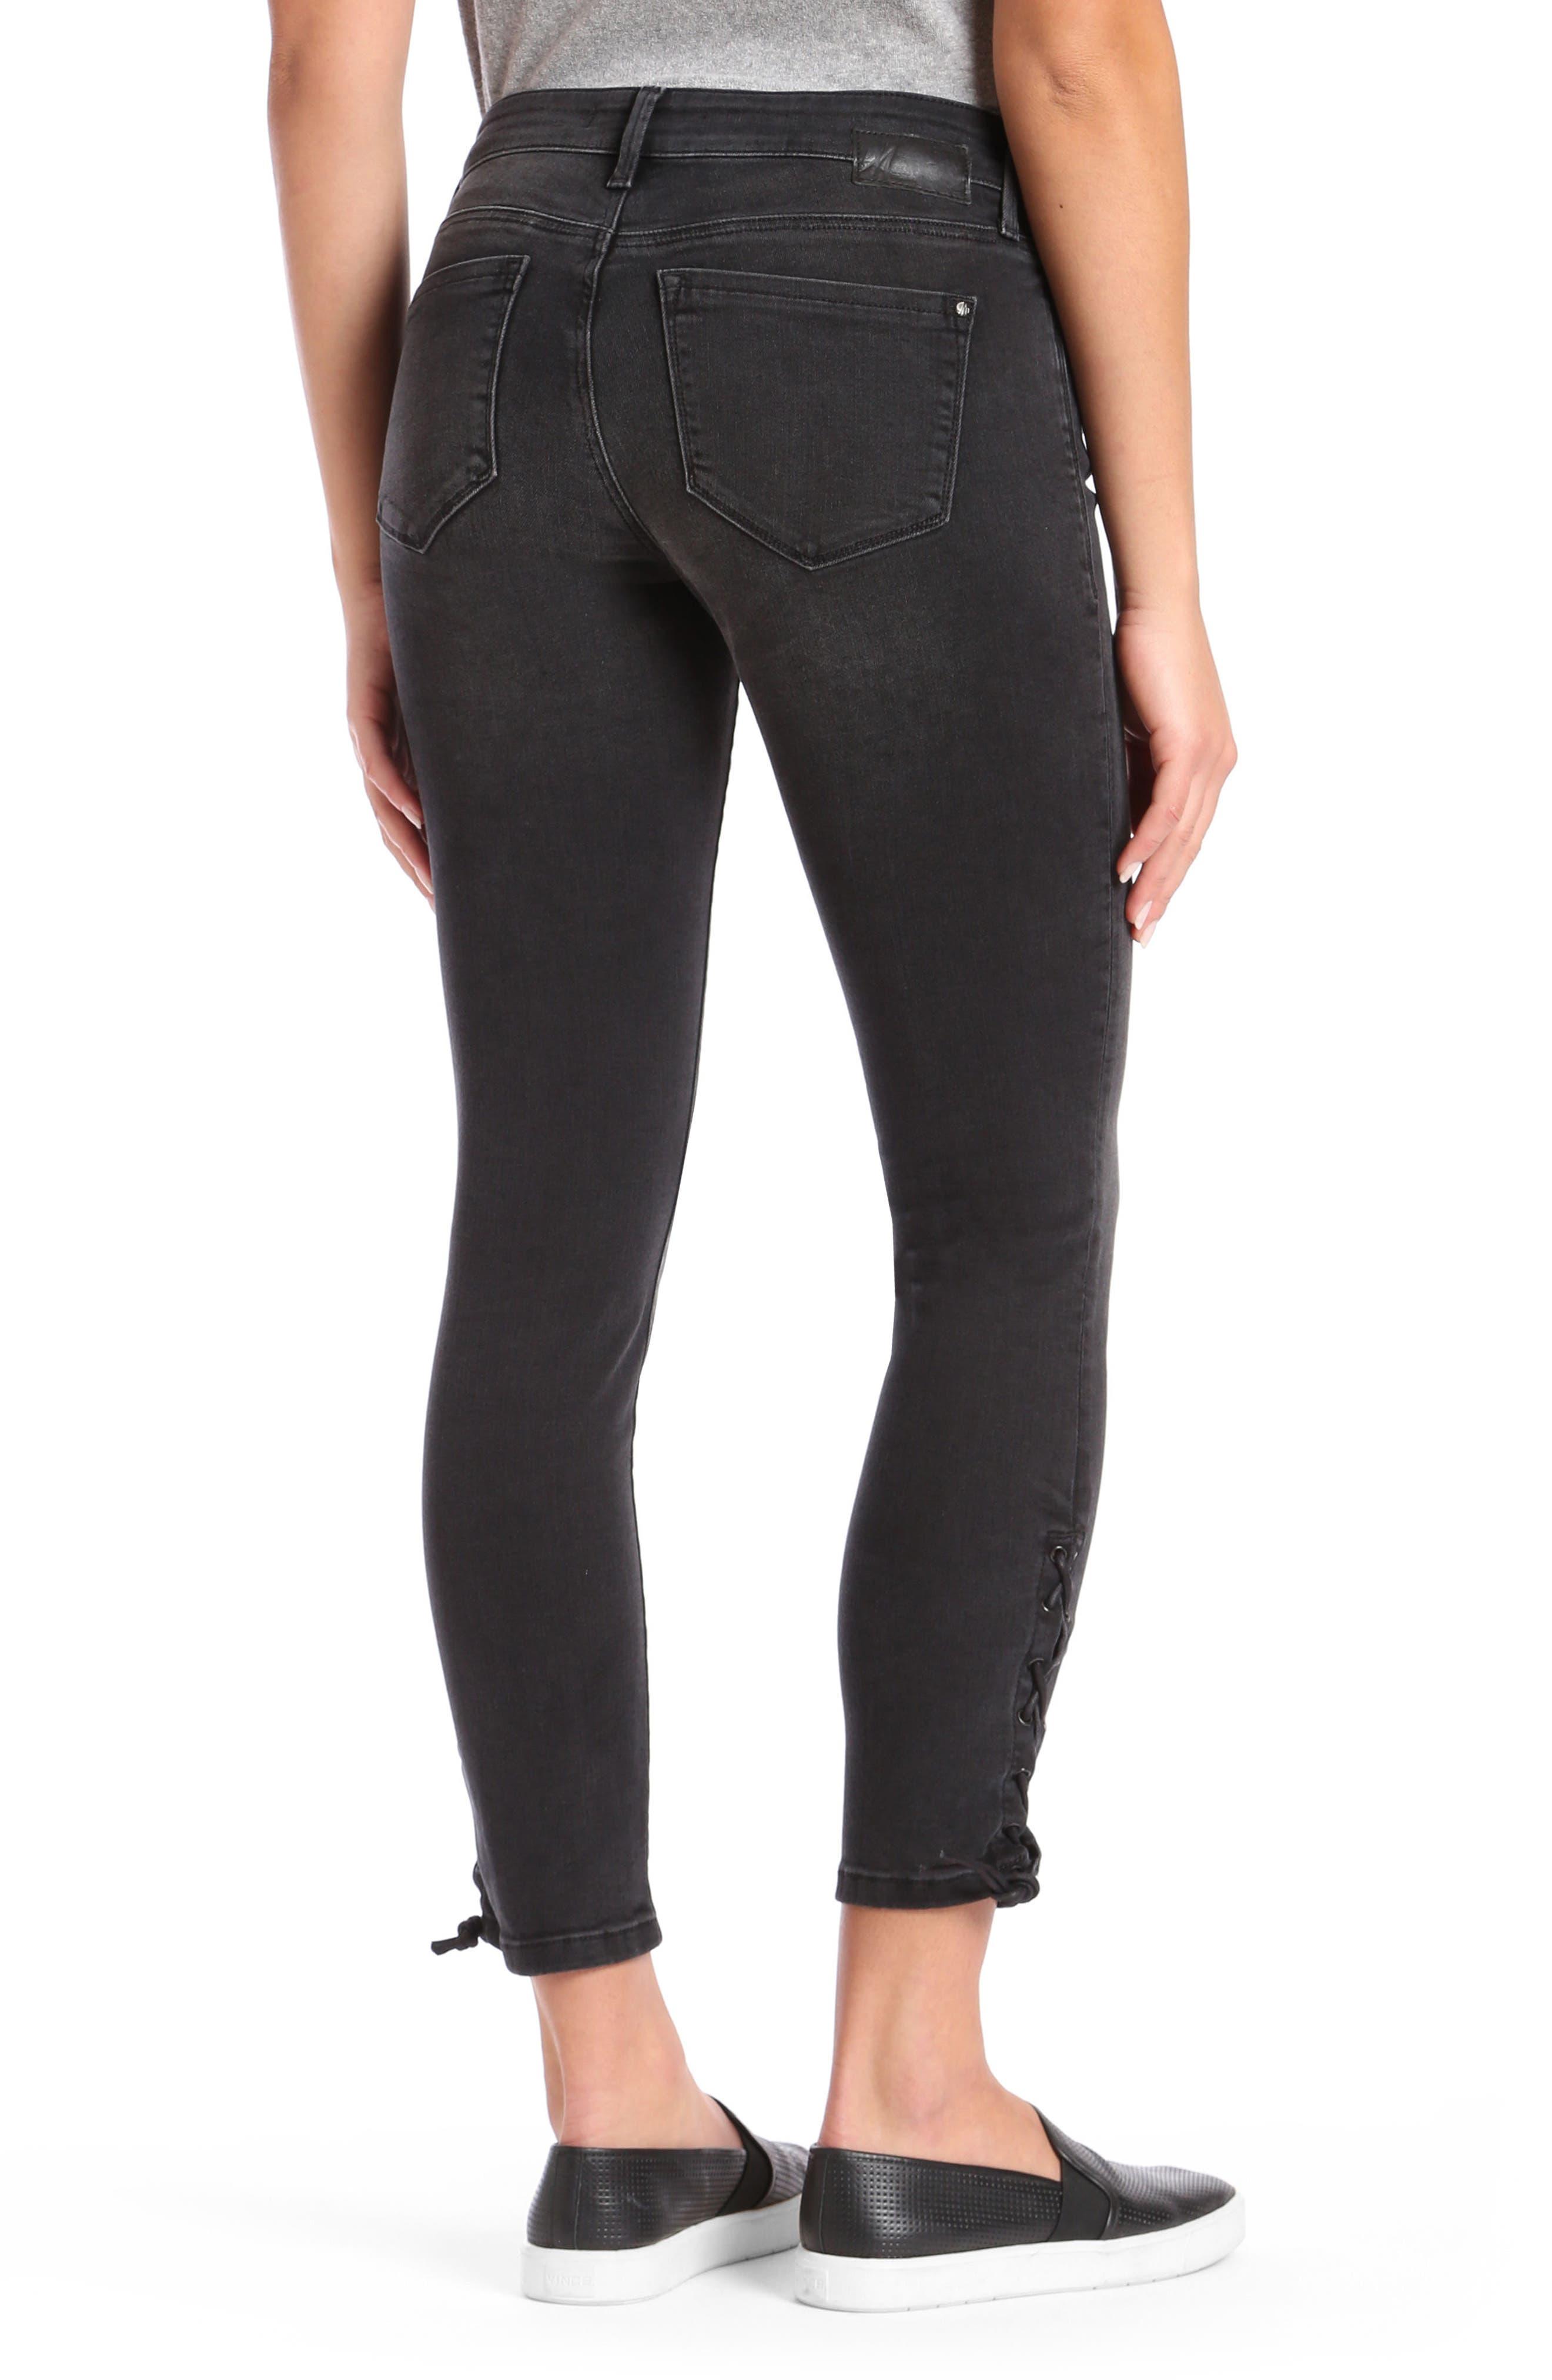 Alternate Image 3  - Mavi Adriana Lace Up Ankle Super Skinny Jeans (Smoke Lace)